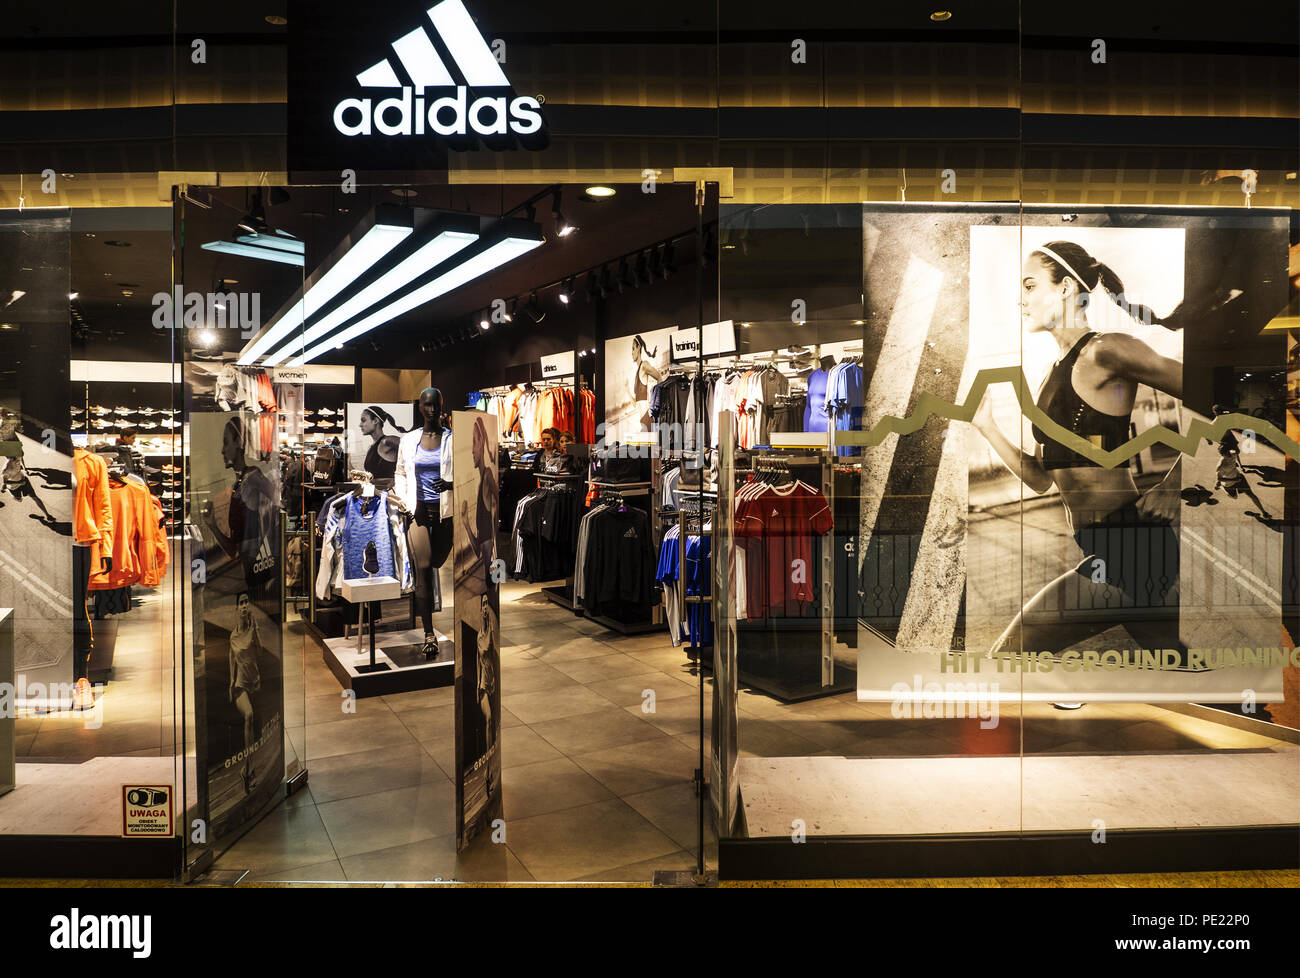 Adidas Store Stock Photos & Adidas Store Stock Images - Alamy